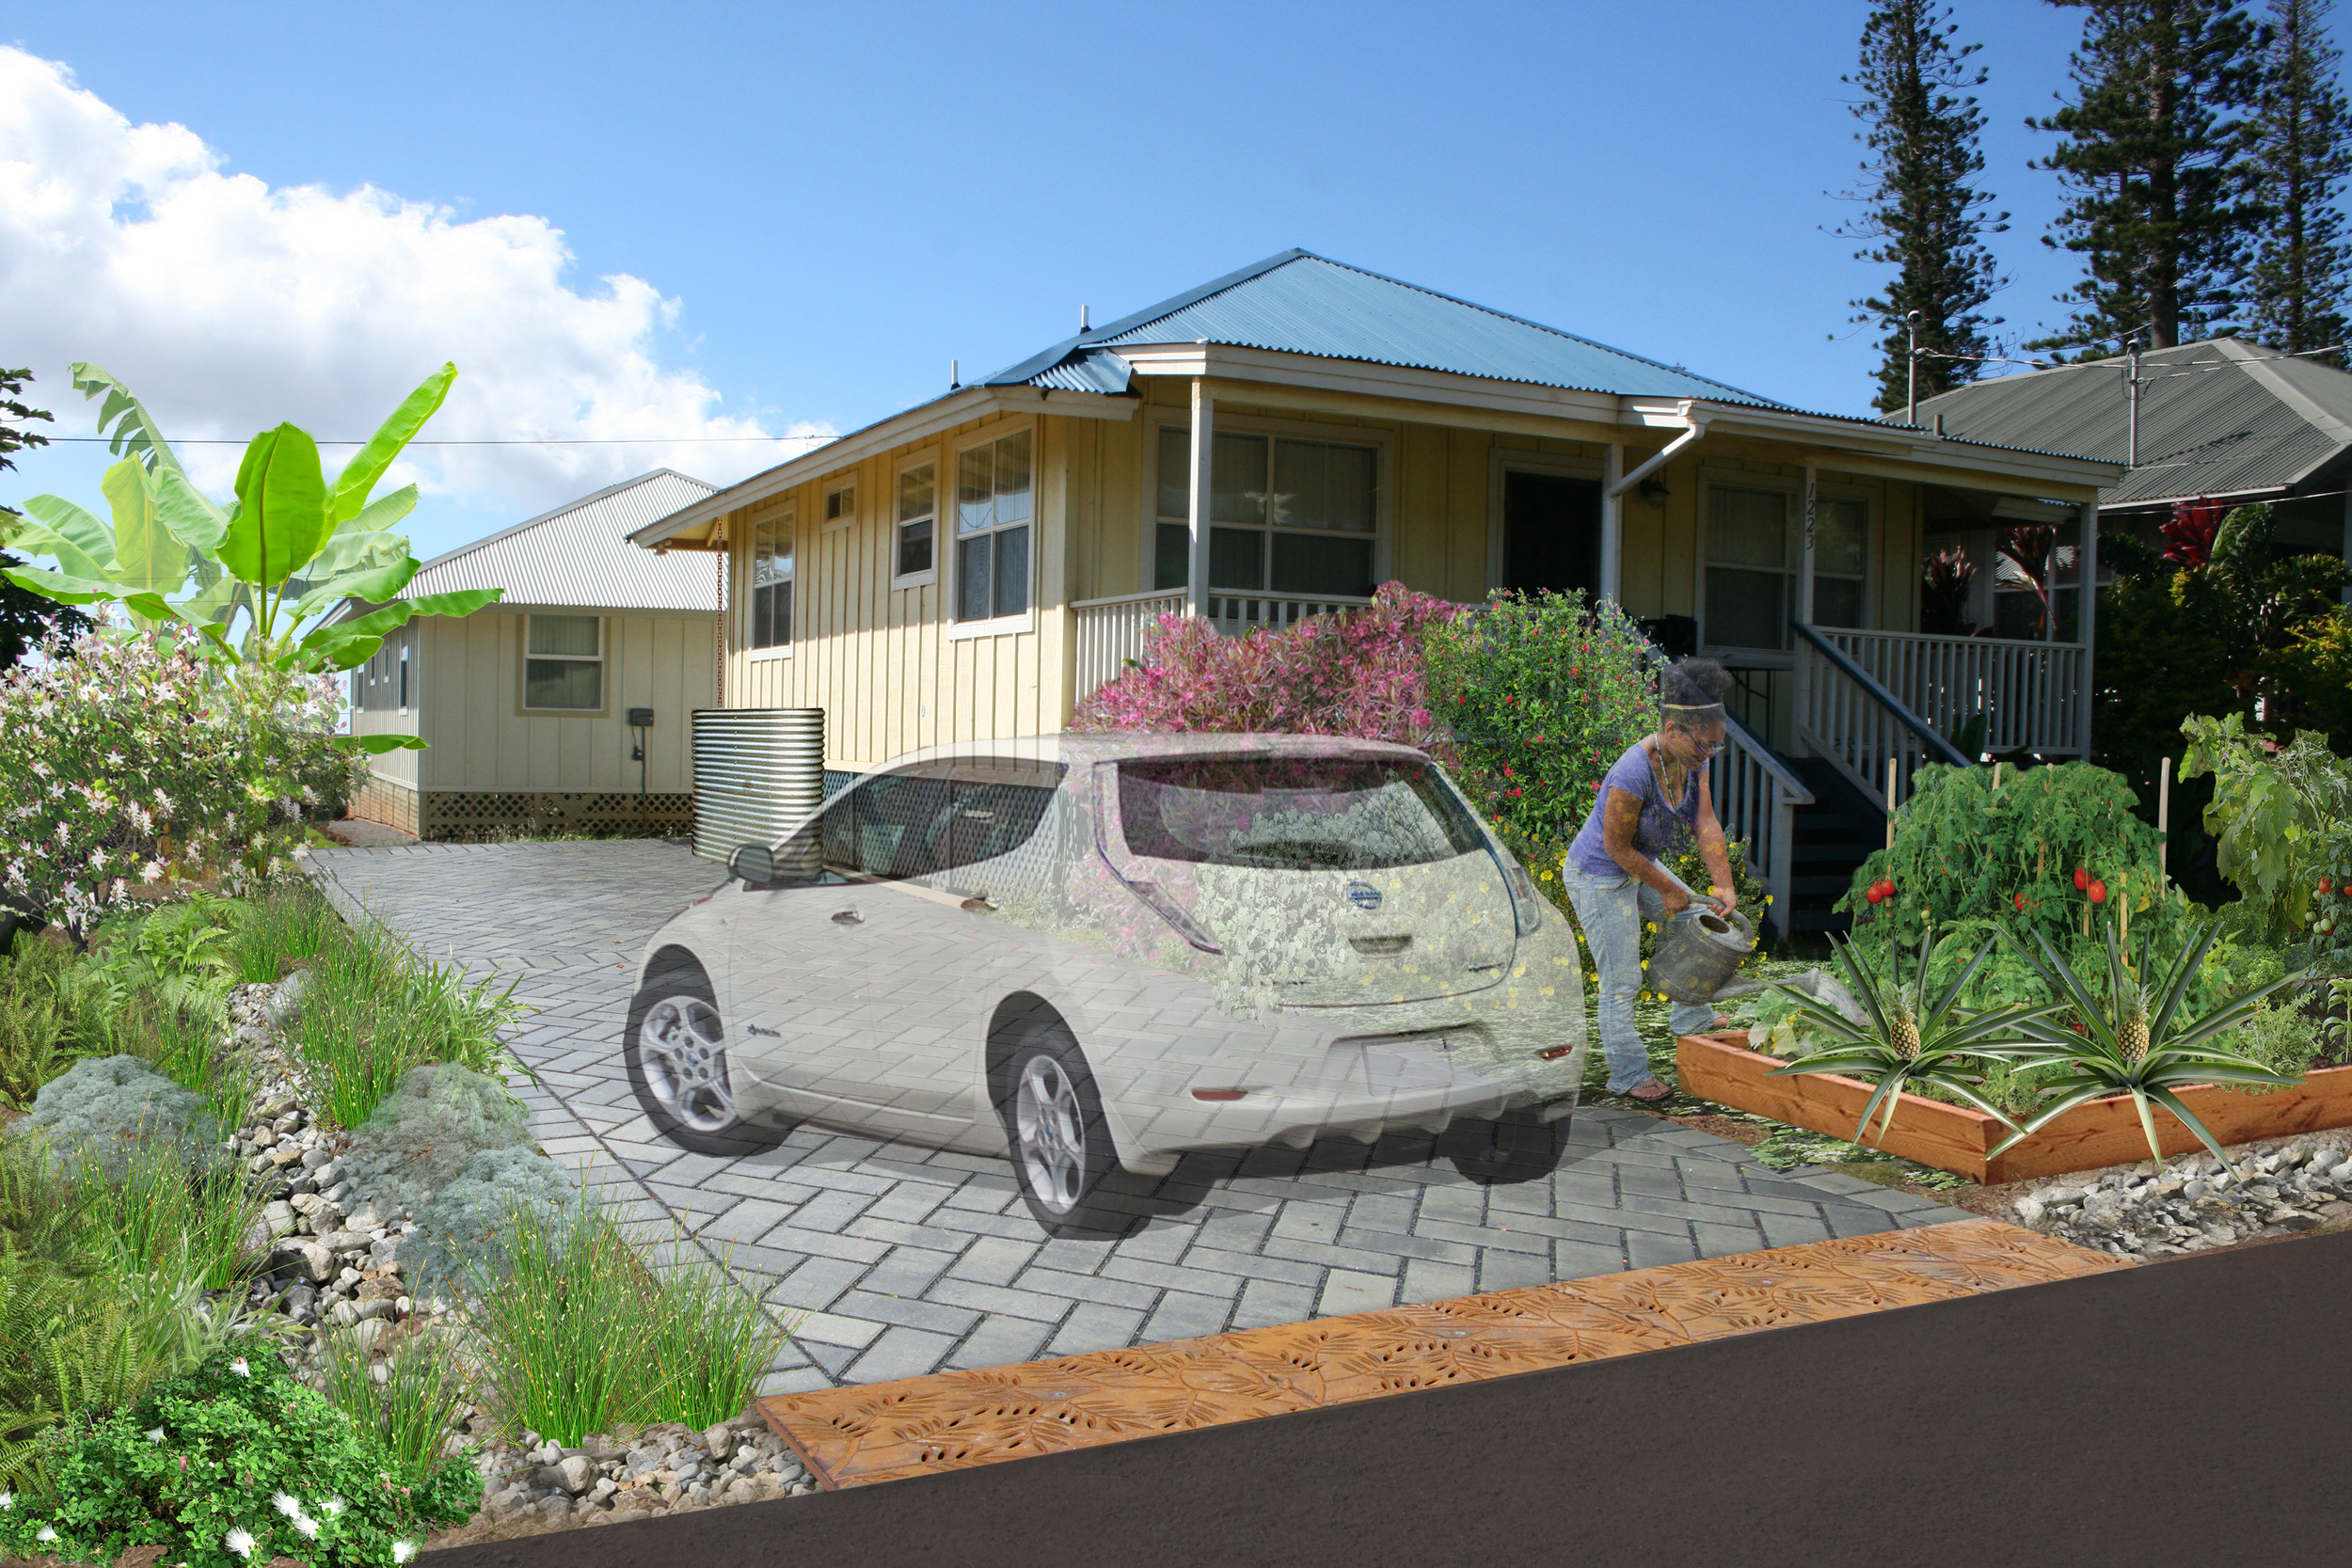 Persp_Plantation+residential+LID_revised+2.27.2014.jpg